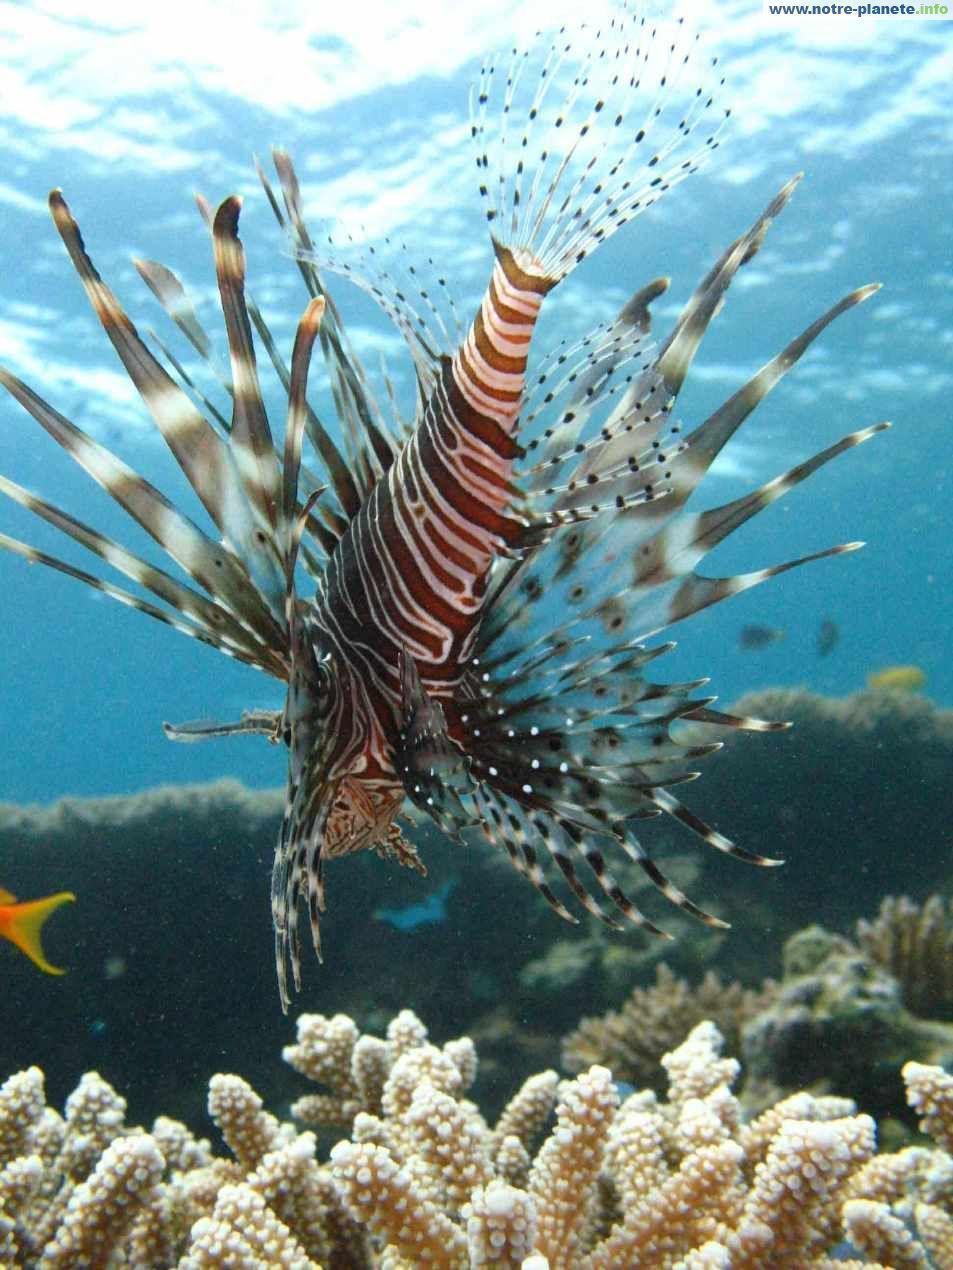 Animaux poissons tropicaux page 5 for Poisson tropicaux